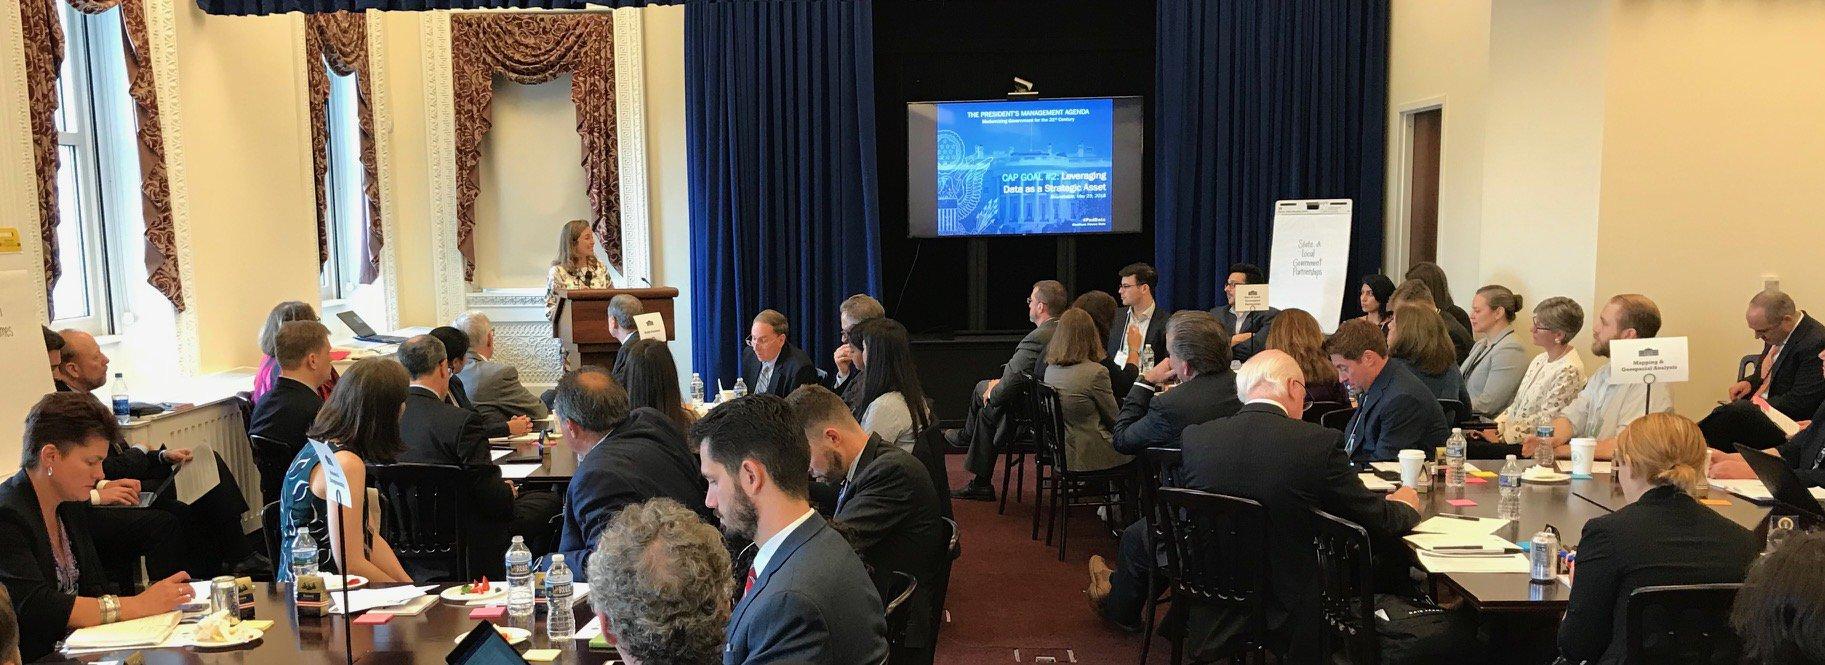 OMB Deputy Director for Management Margaret Wiechert addresses White House Data Roundtable. Photo by Beth Beck